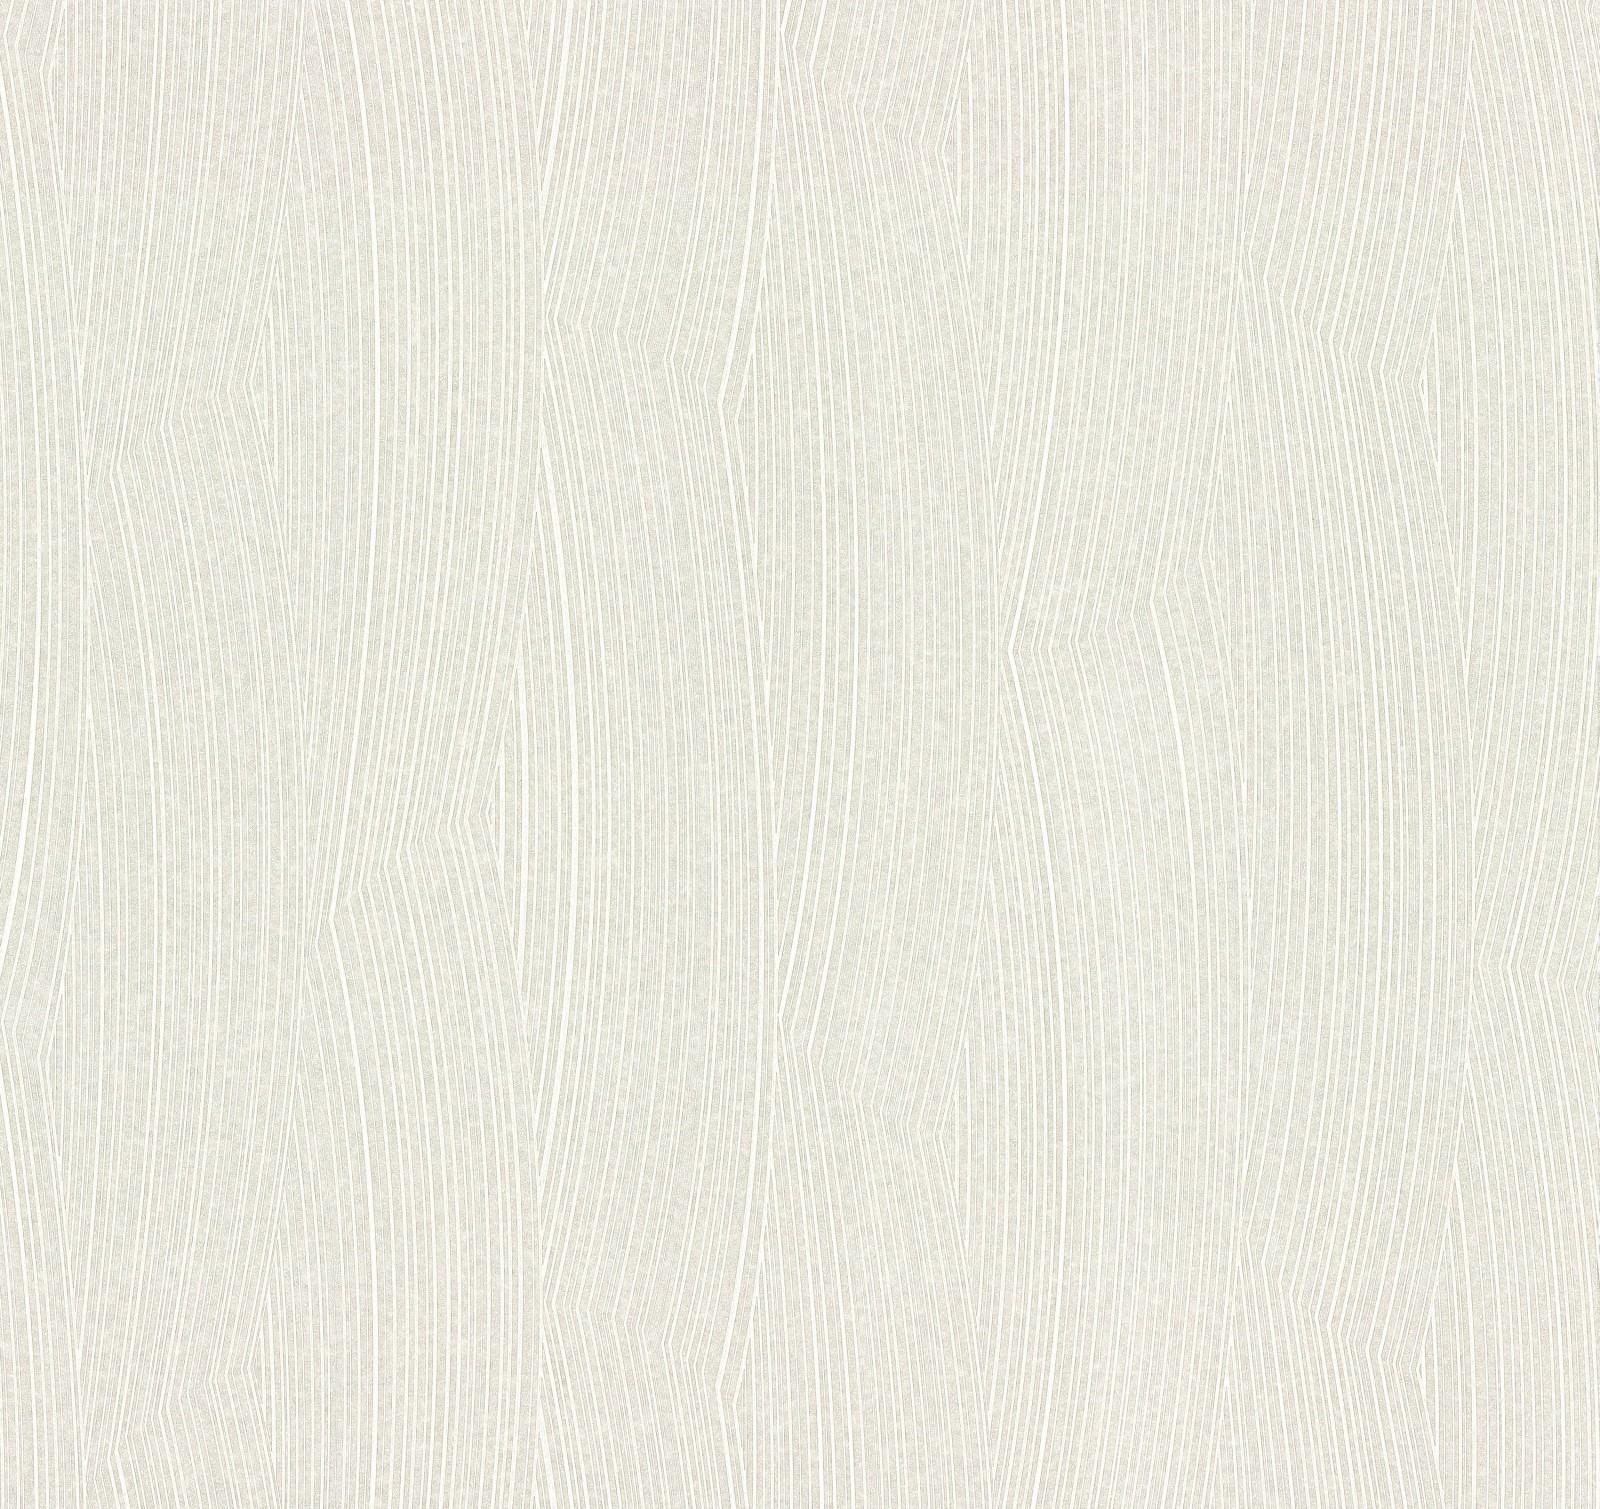 tapete guido maria kretschmer uni creme 02467 50. Black Bedroom Furniture Sets. Home Design Ideas